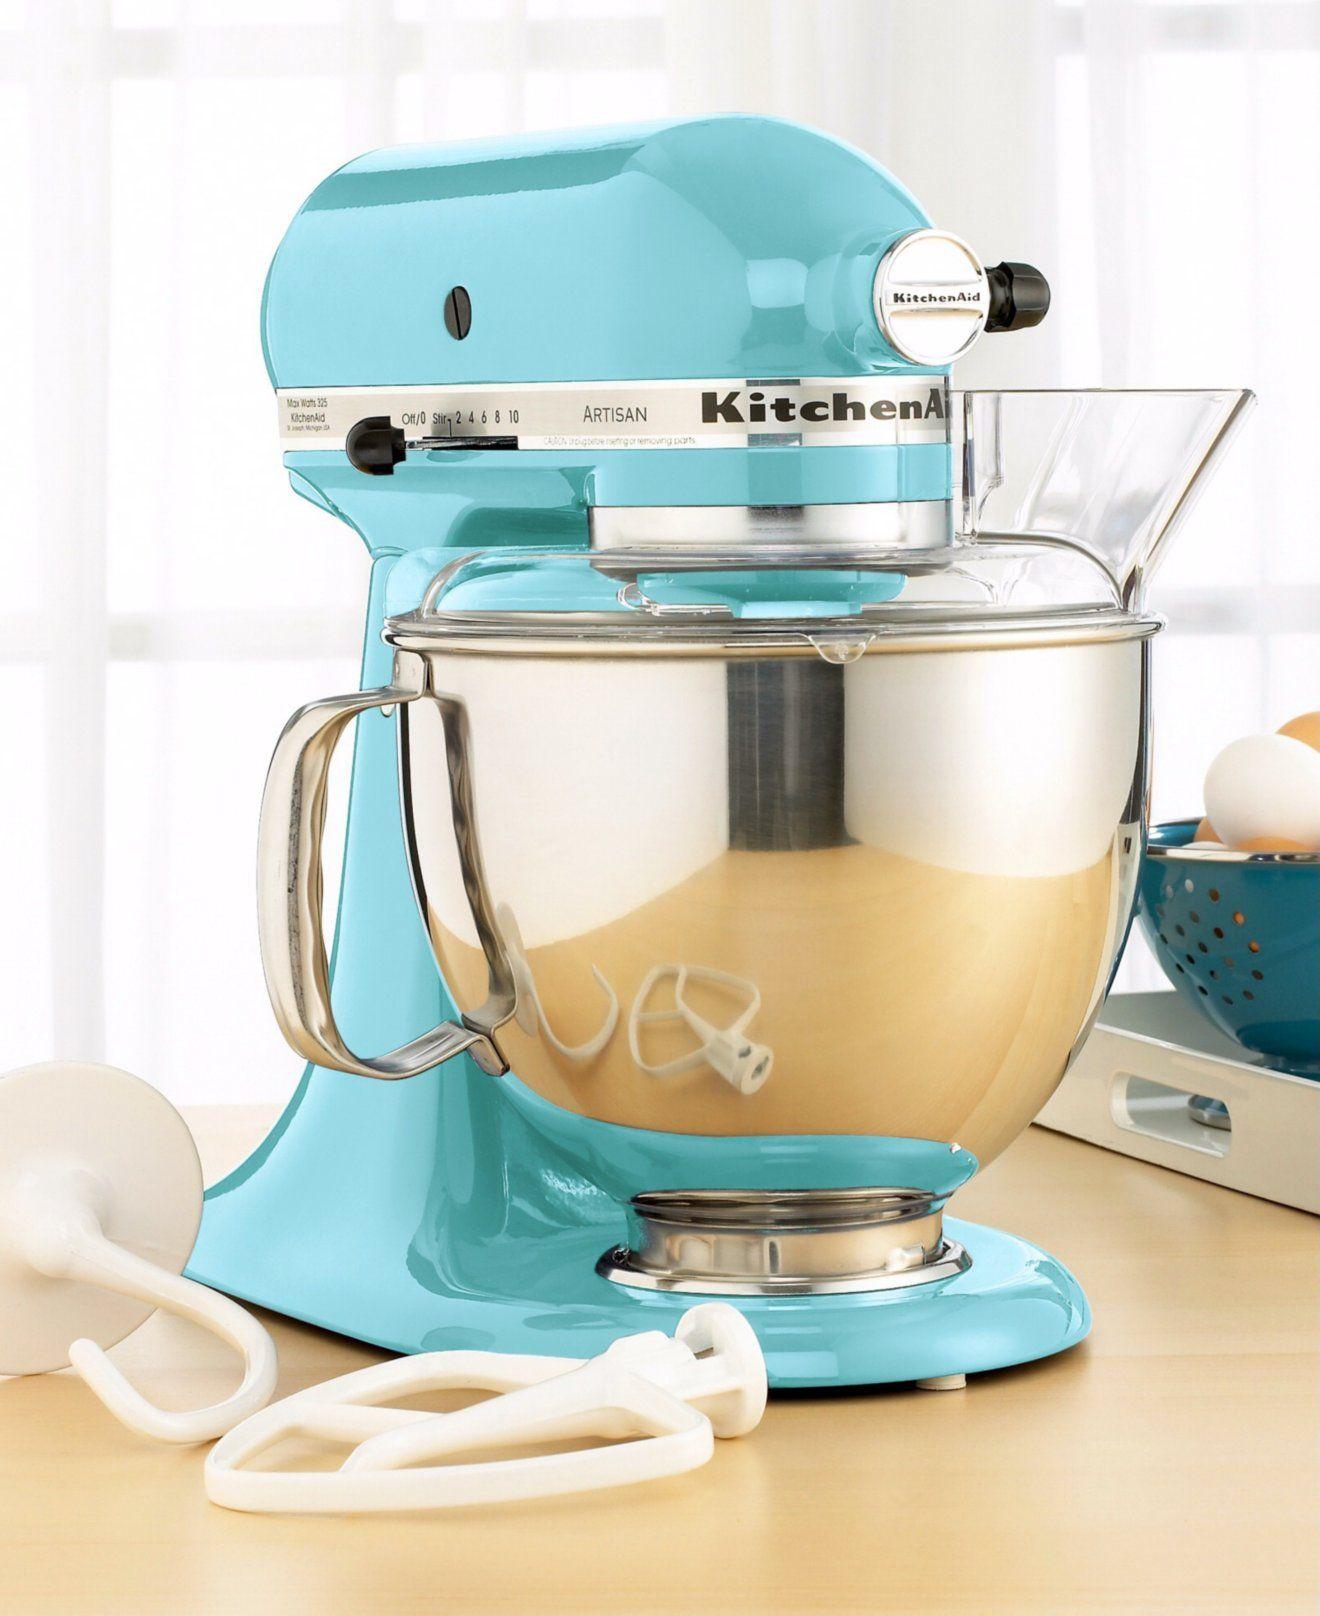 KitchenAid KSM150PS Artisan 5 Qt. Stand Mixer | Stand mixers ...